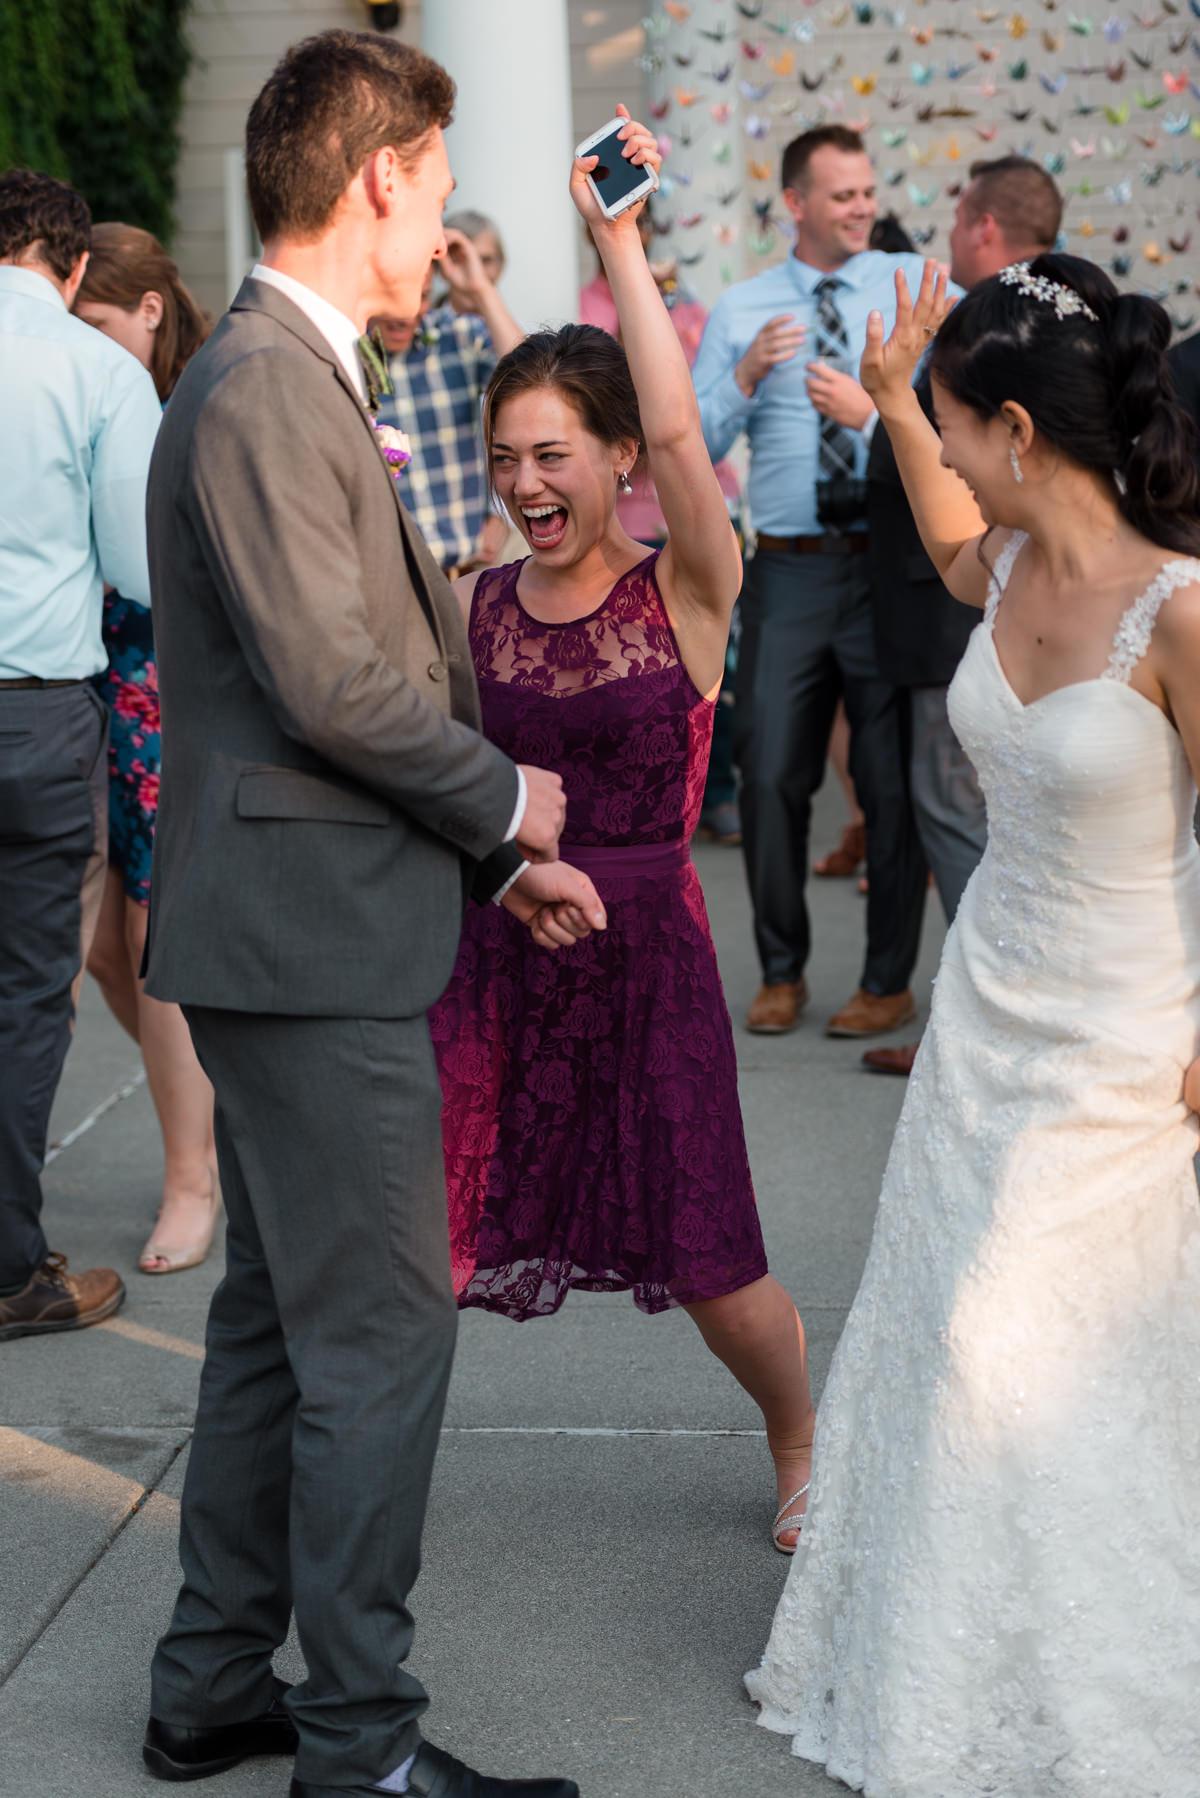 Andrew Tat - Documentary Wedding Photography - Heritage Hall - Kirkland, Washington - Grace & James - 84.JPG